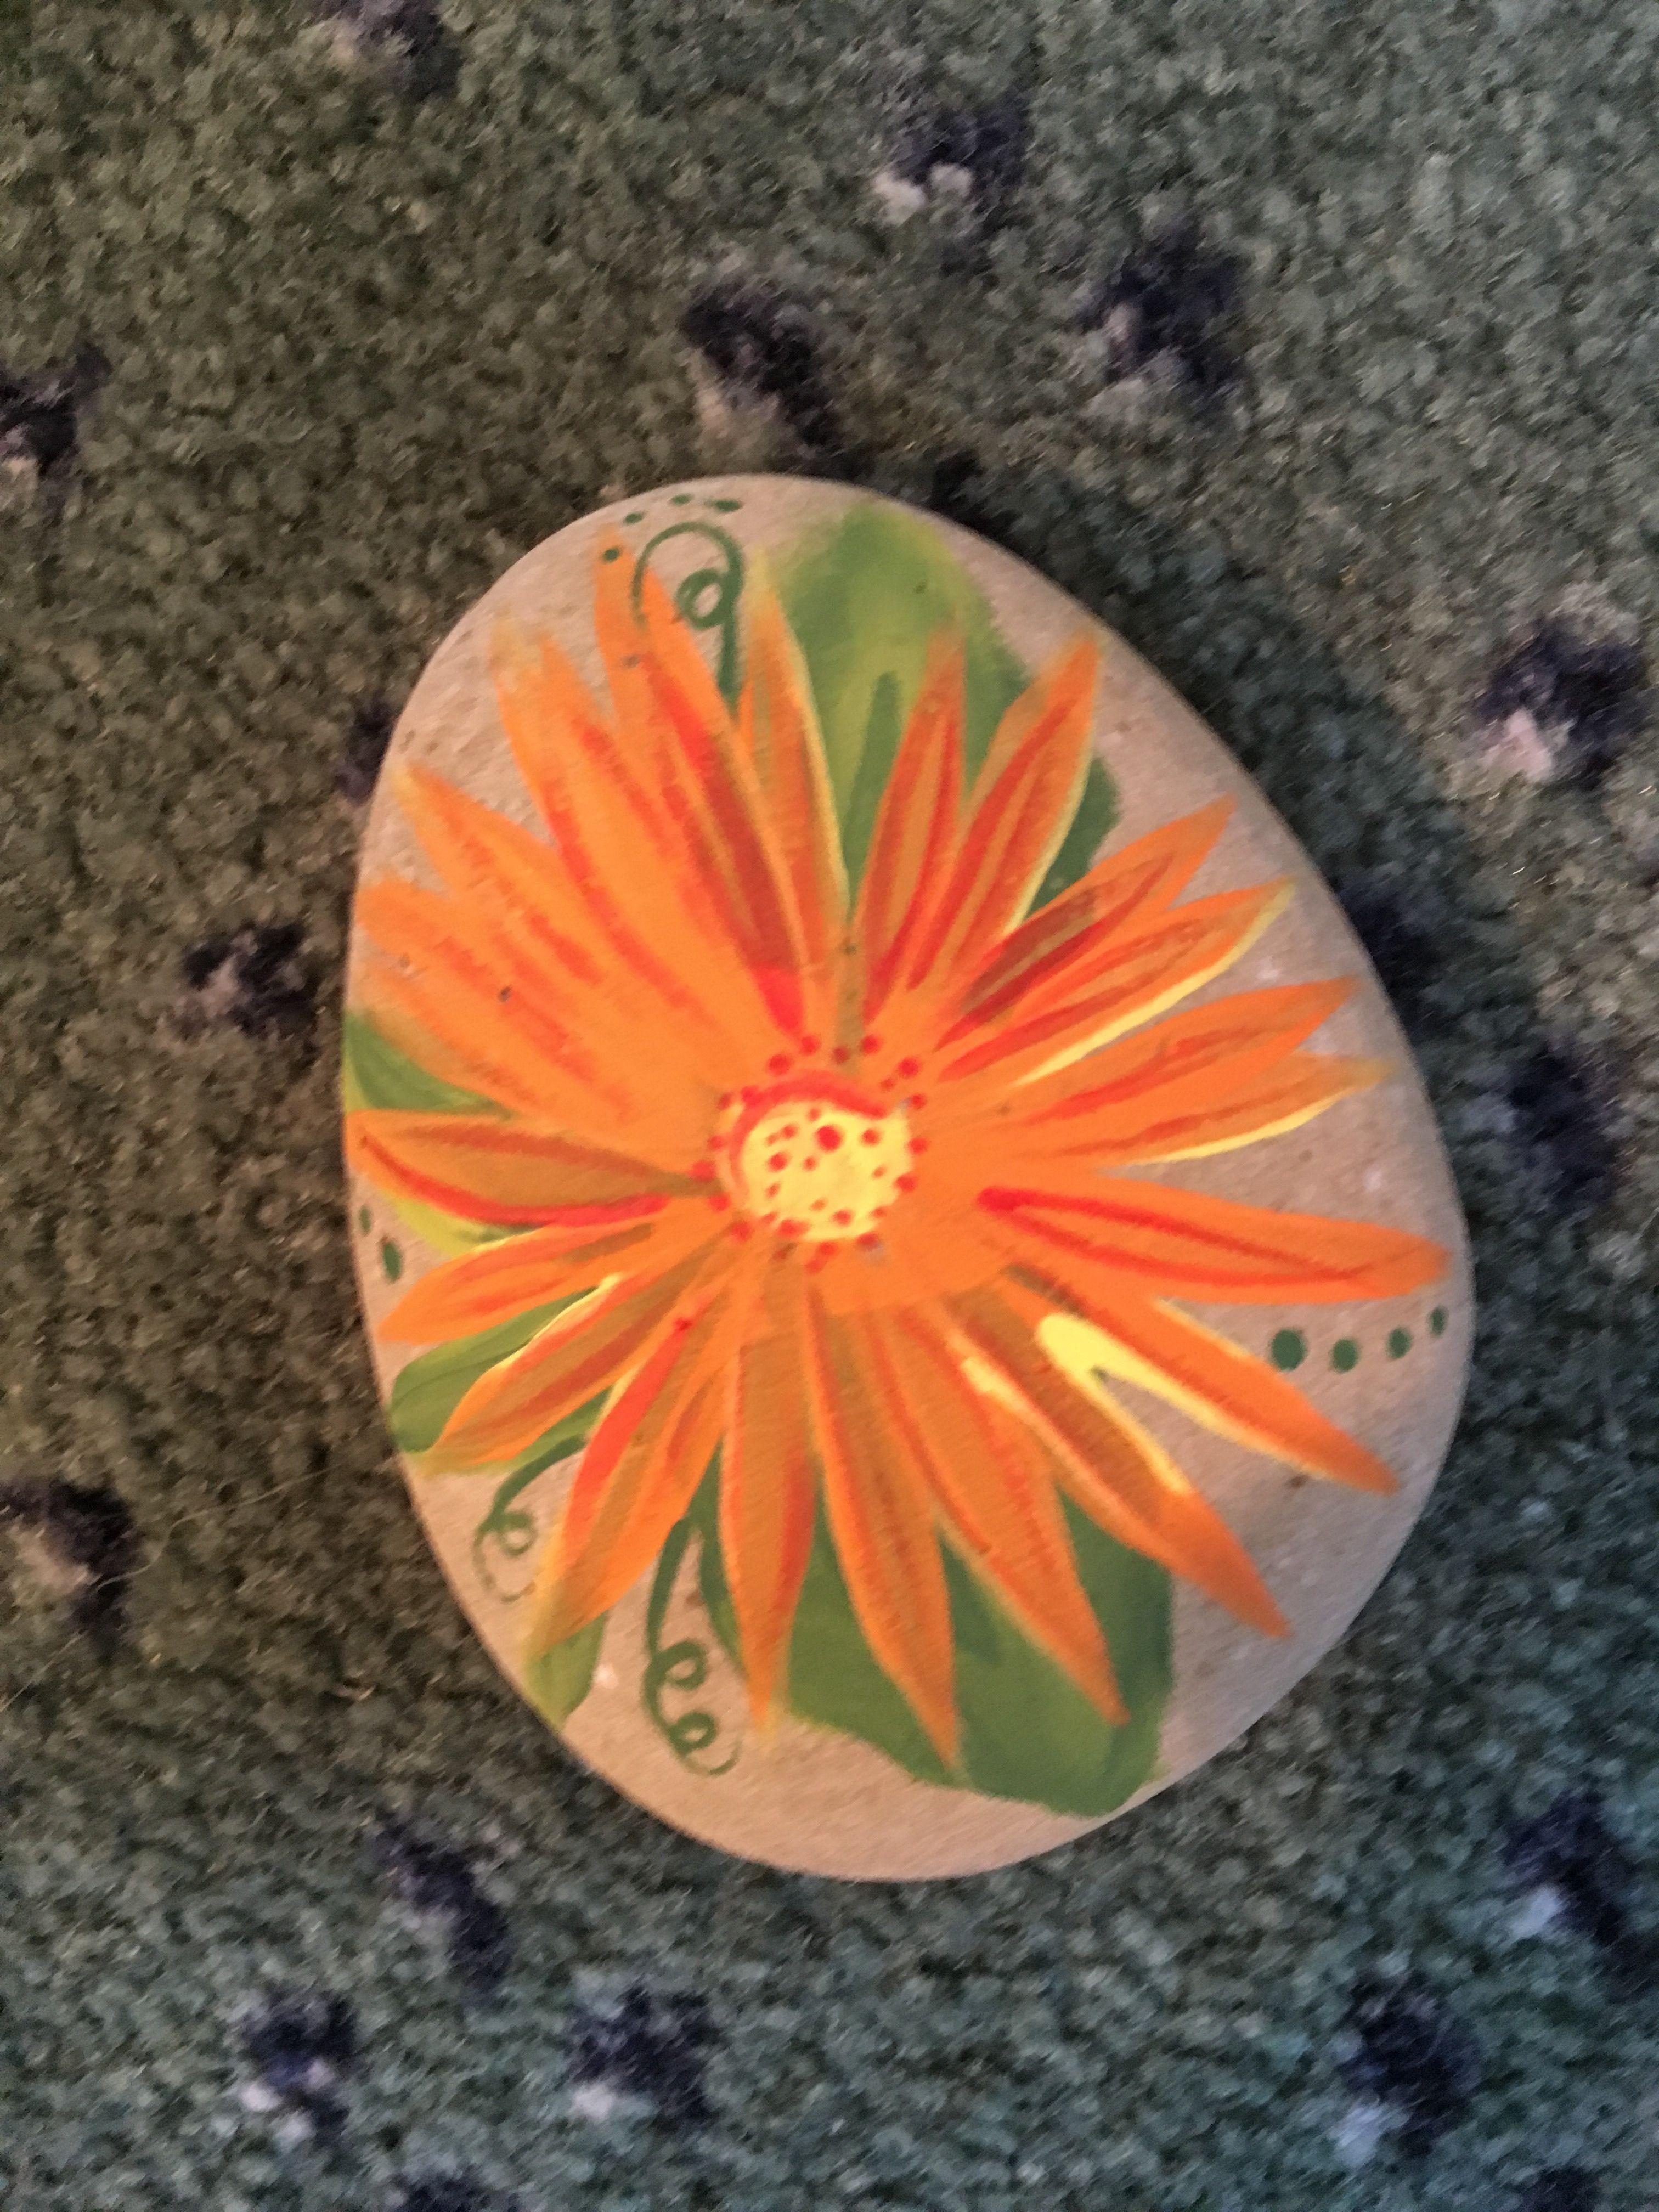 Painted Rock Pretty Orange Flower Arts Crafts Painted Rocks